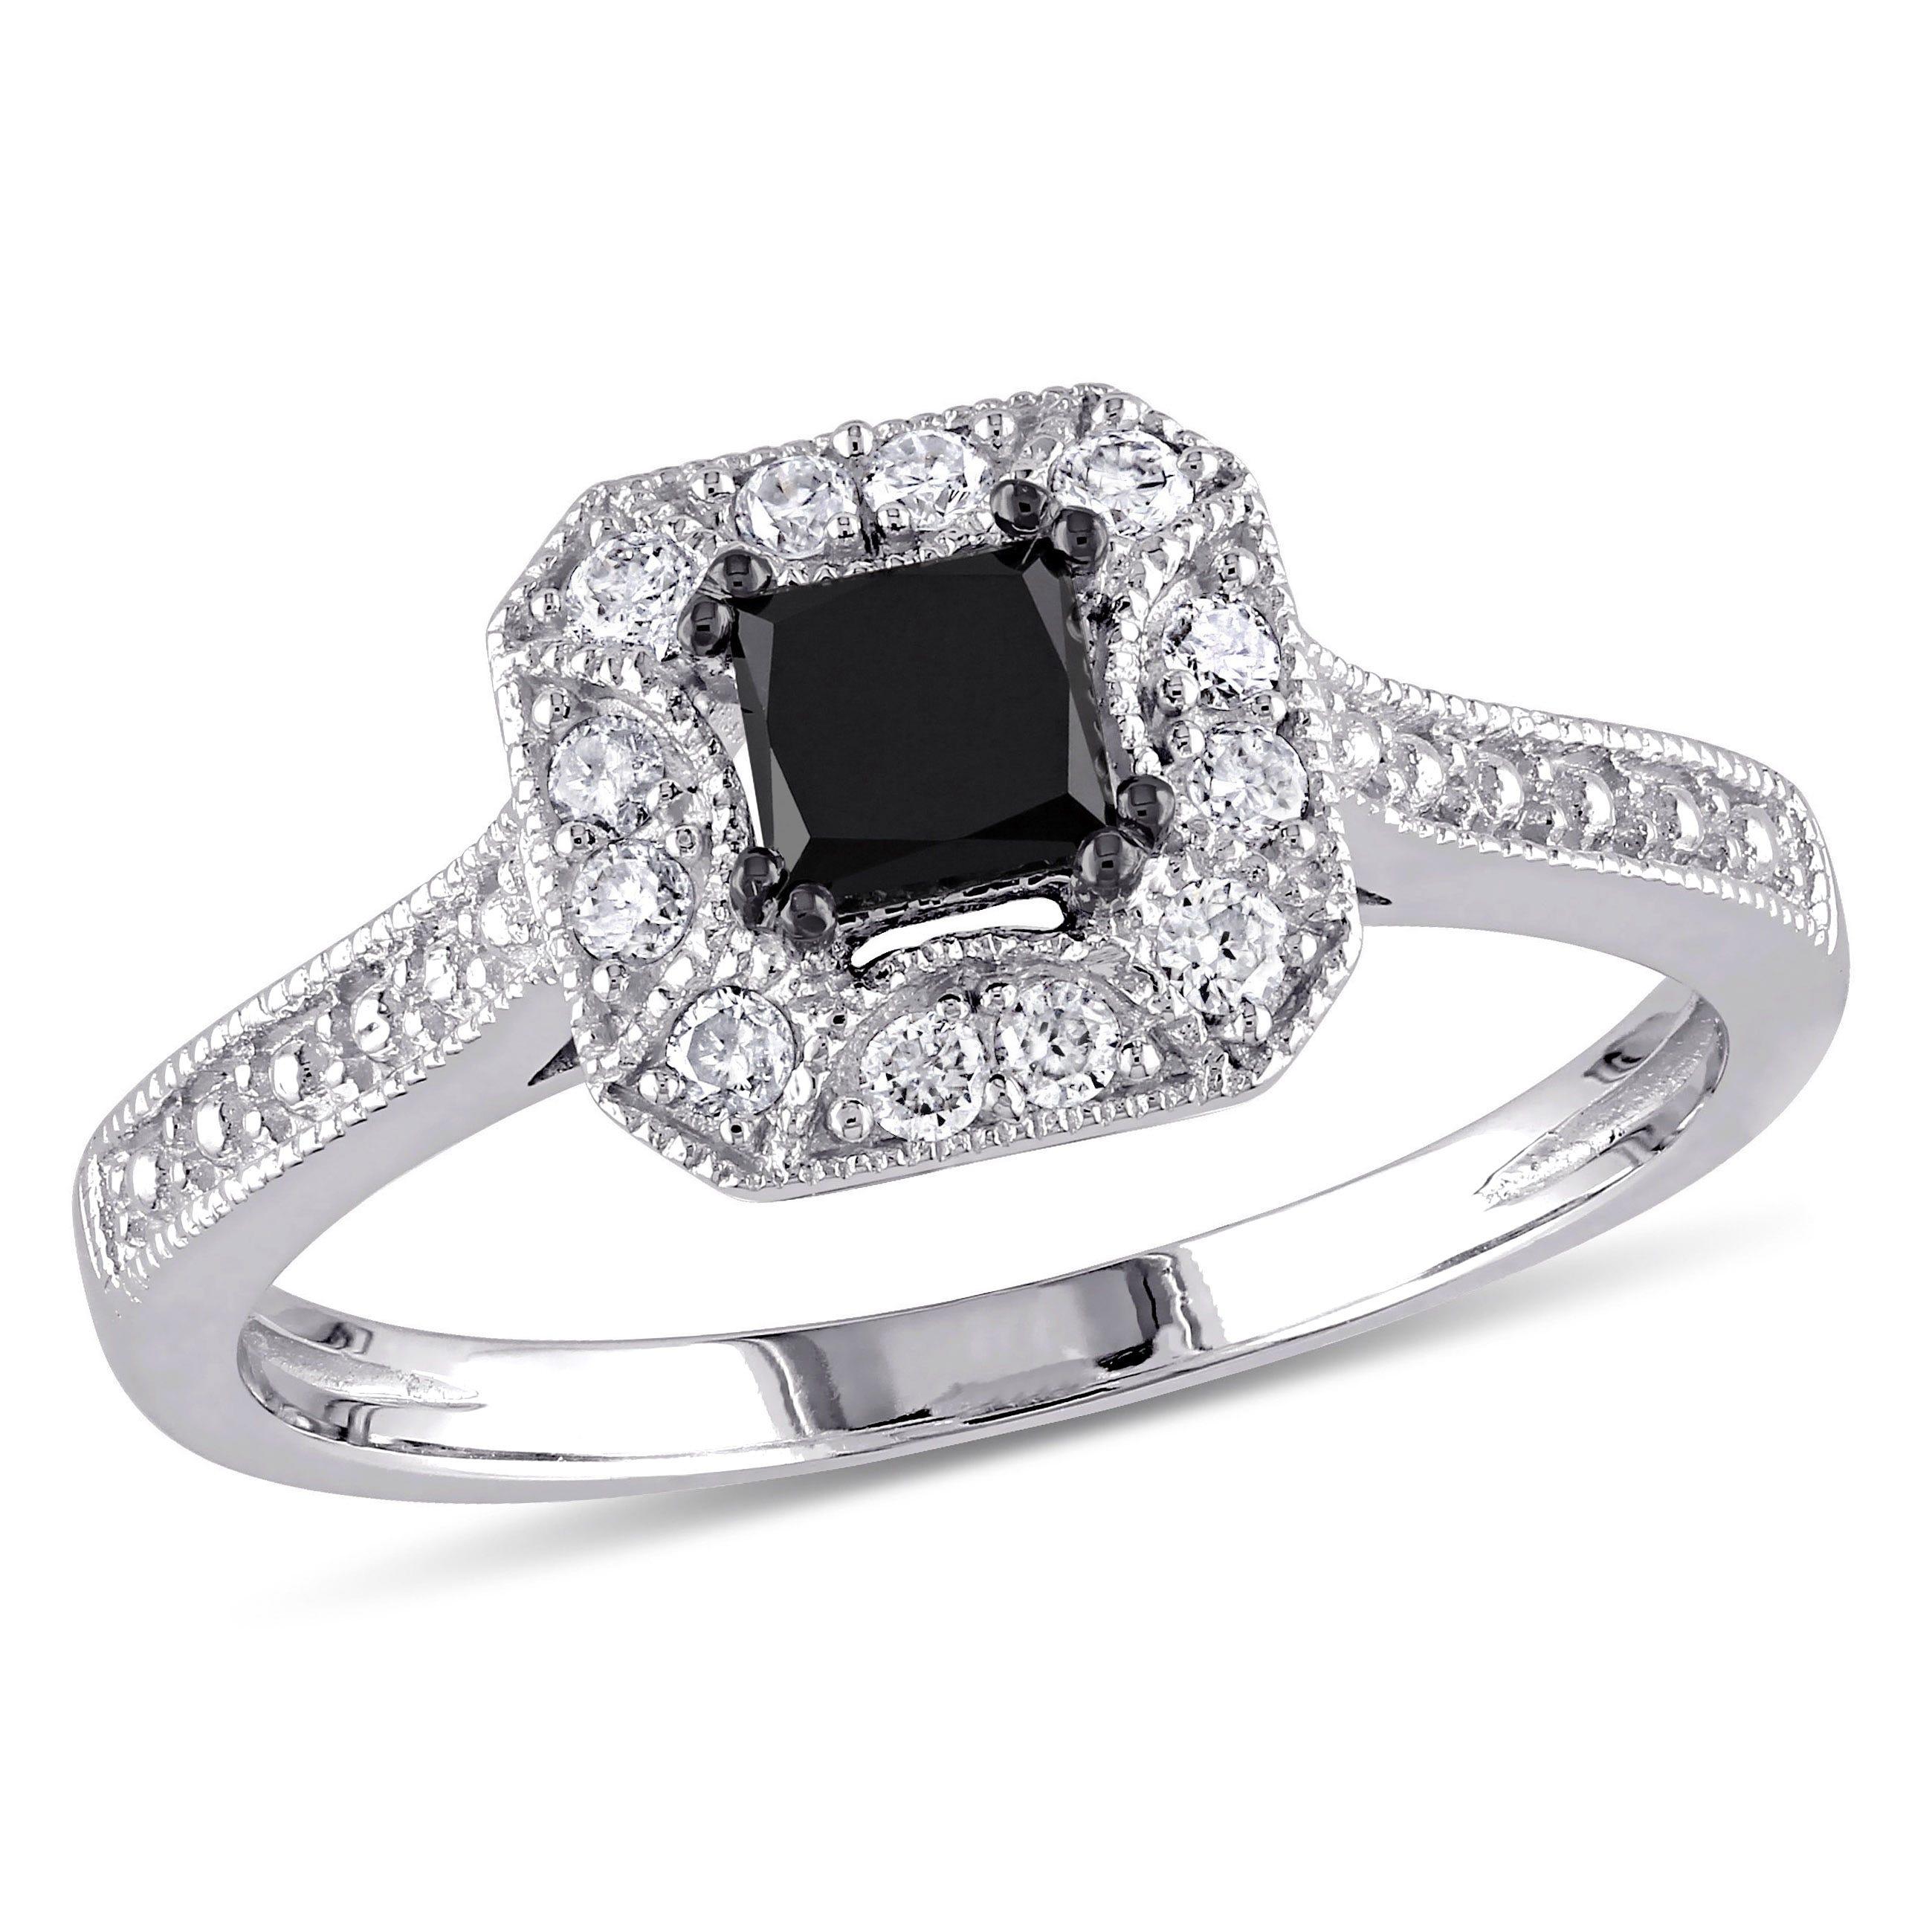 Princess-Cut Black & White Diamond Halo 3/5ctw. Engagement Ring in 10k White Gold